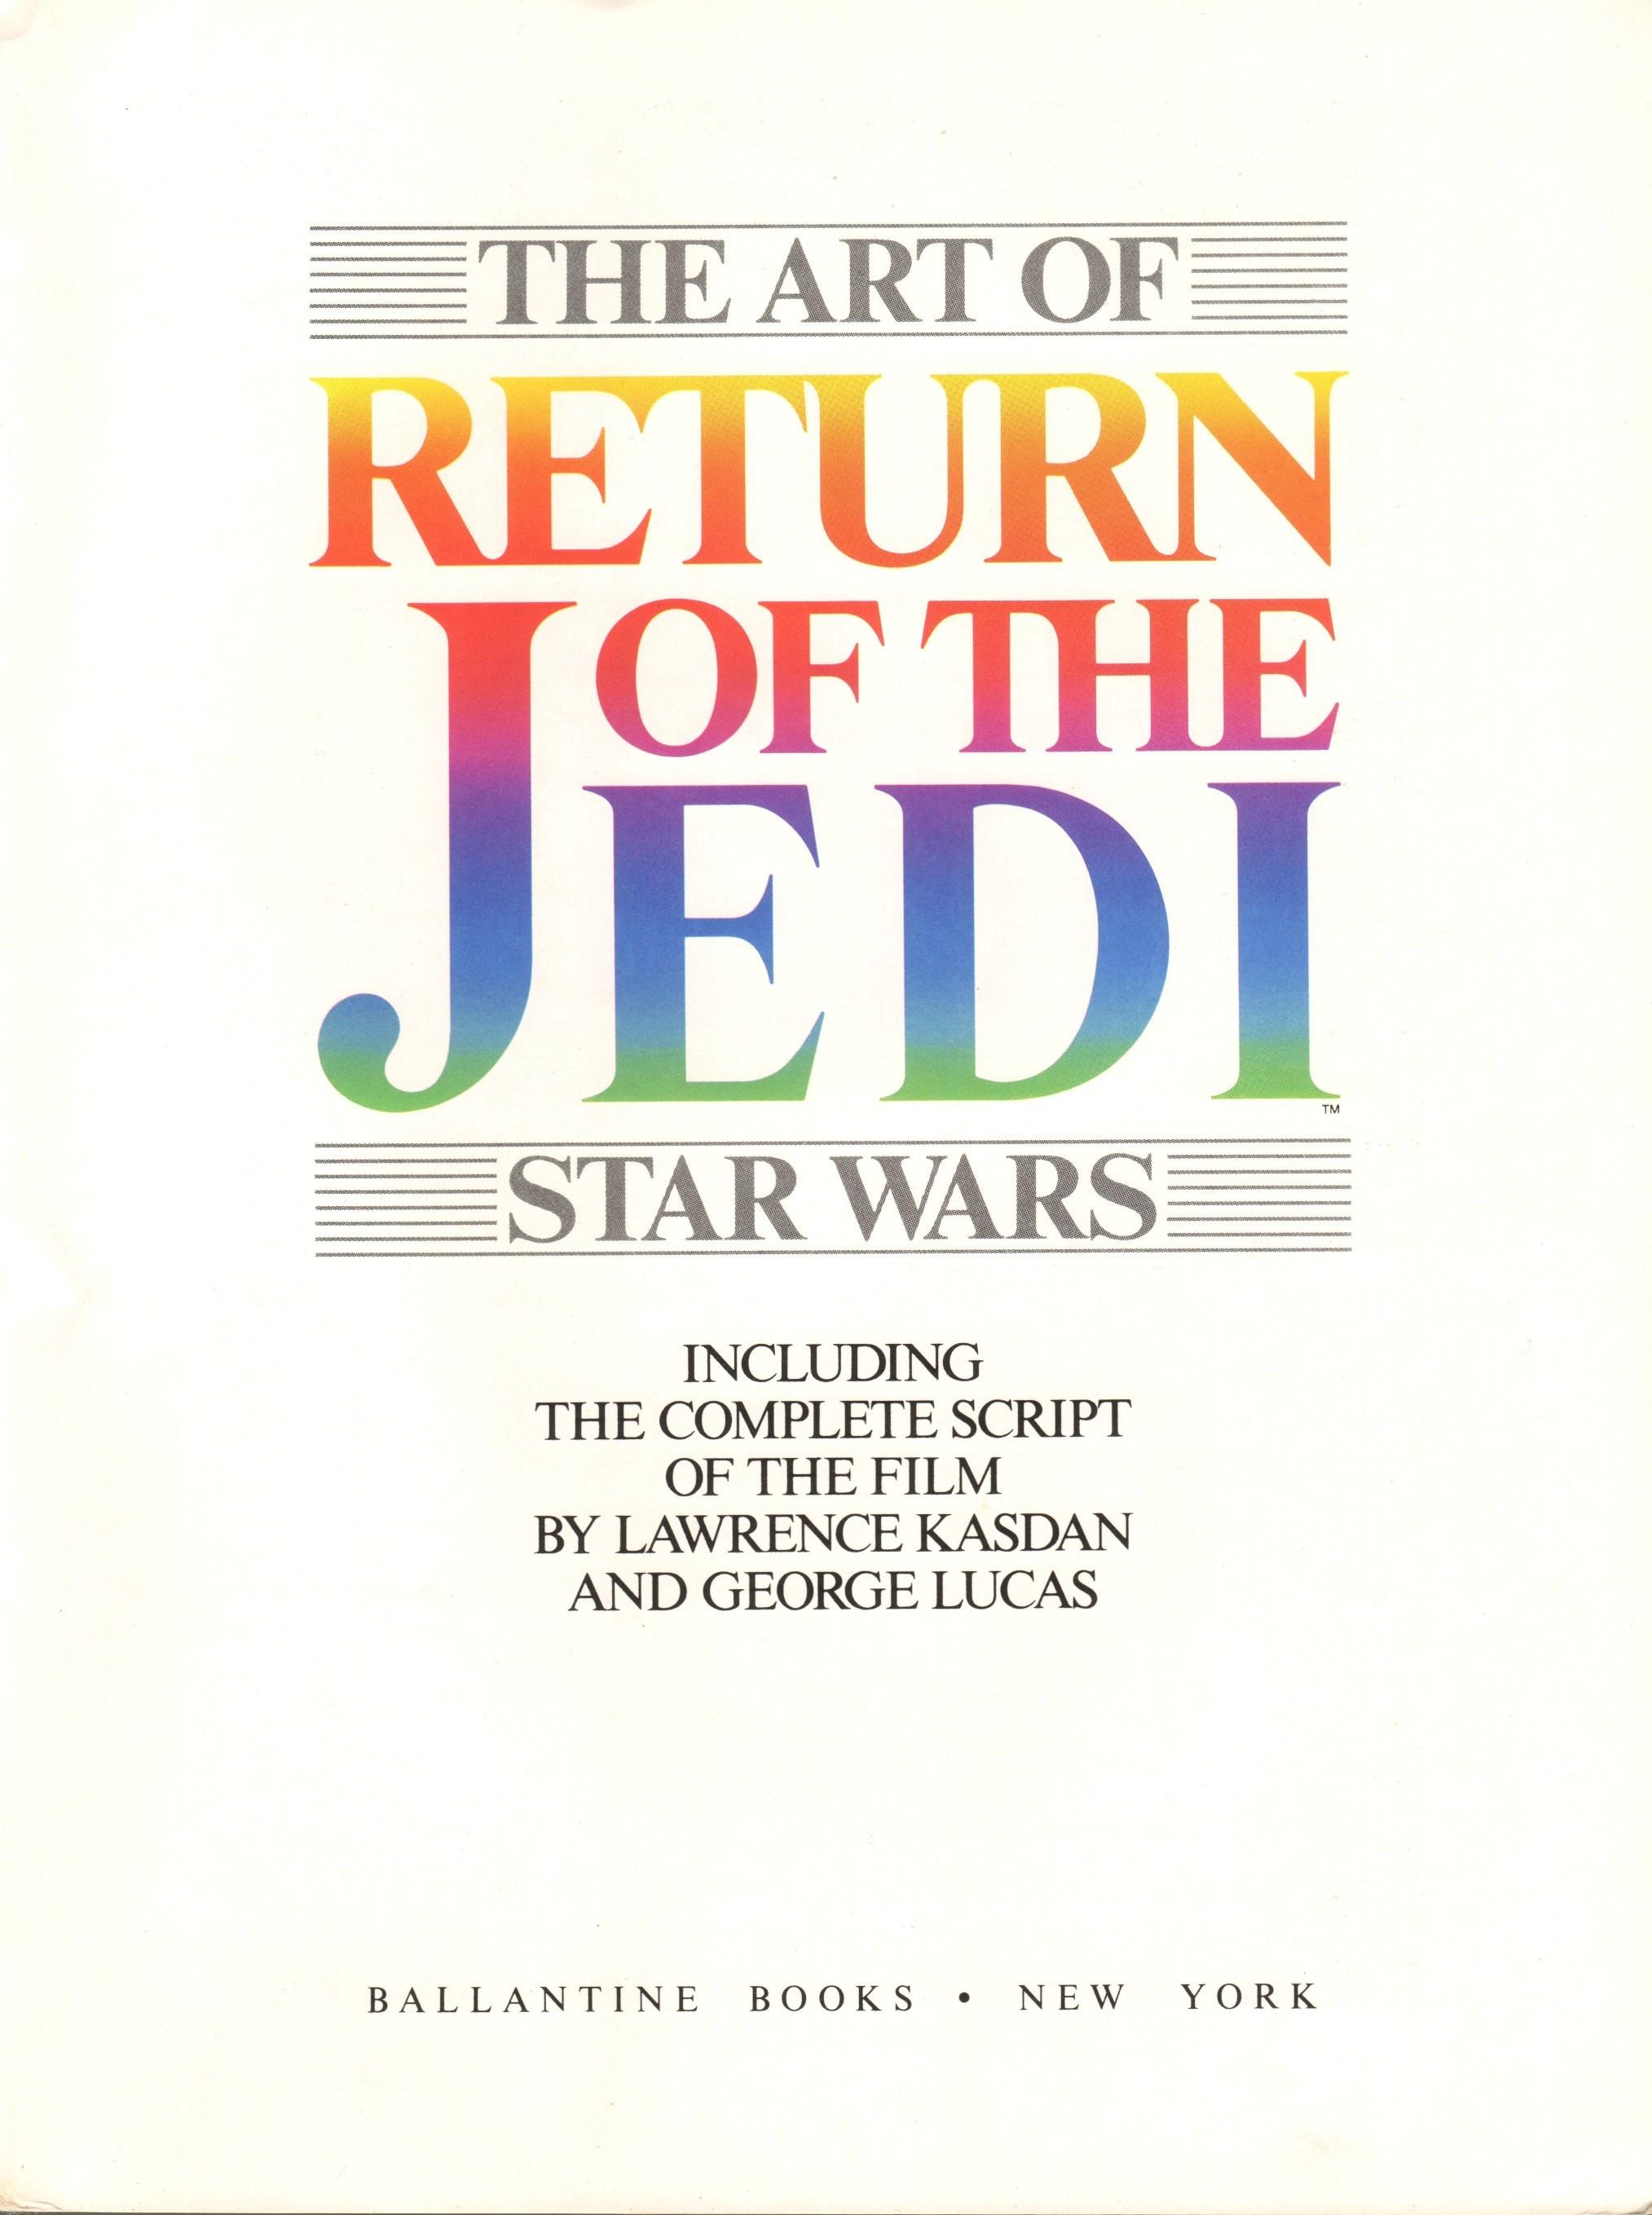 Art of Return of the Jedi (b0bafett_Empire)-p000d